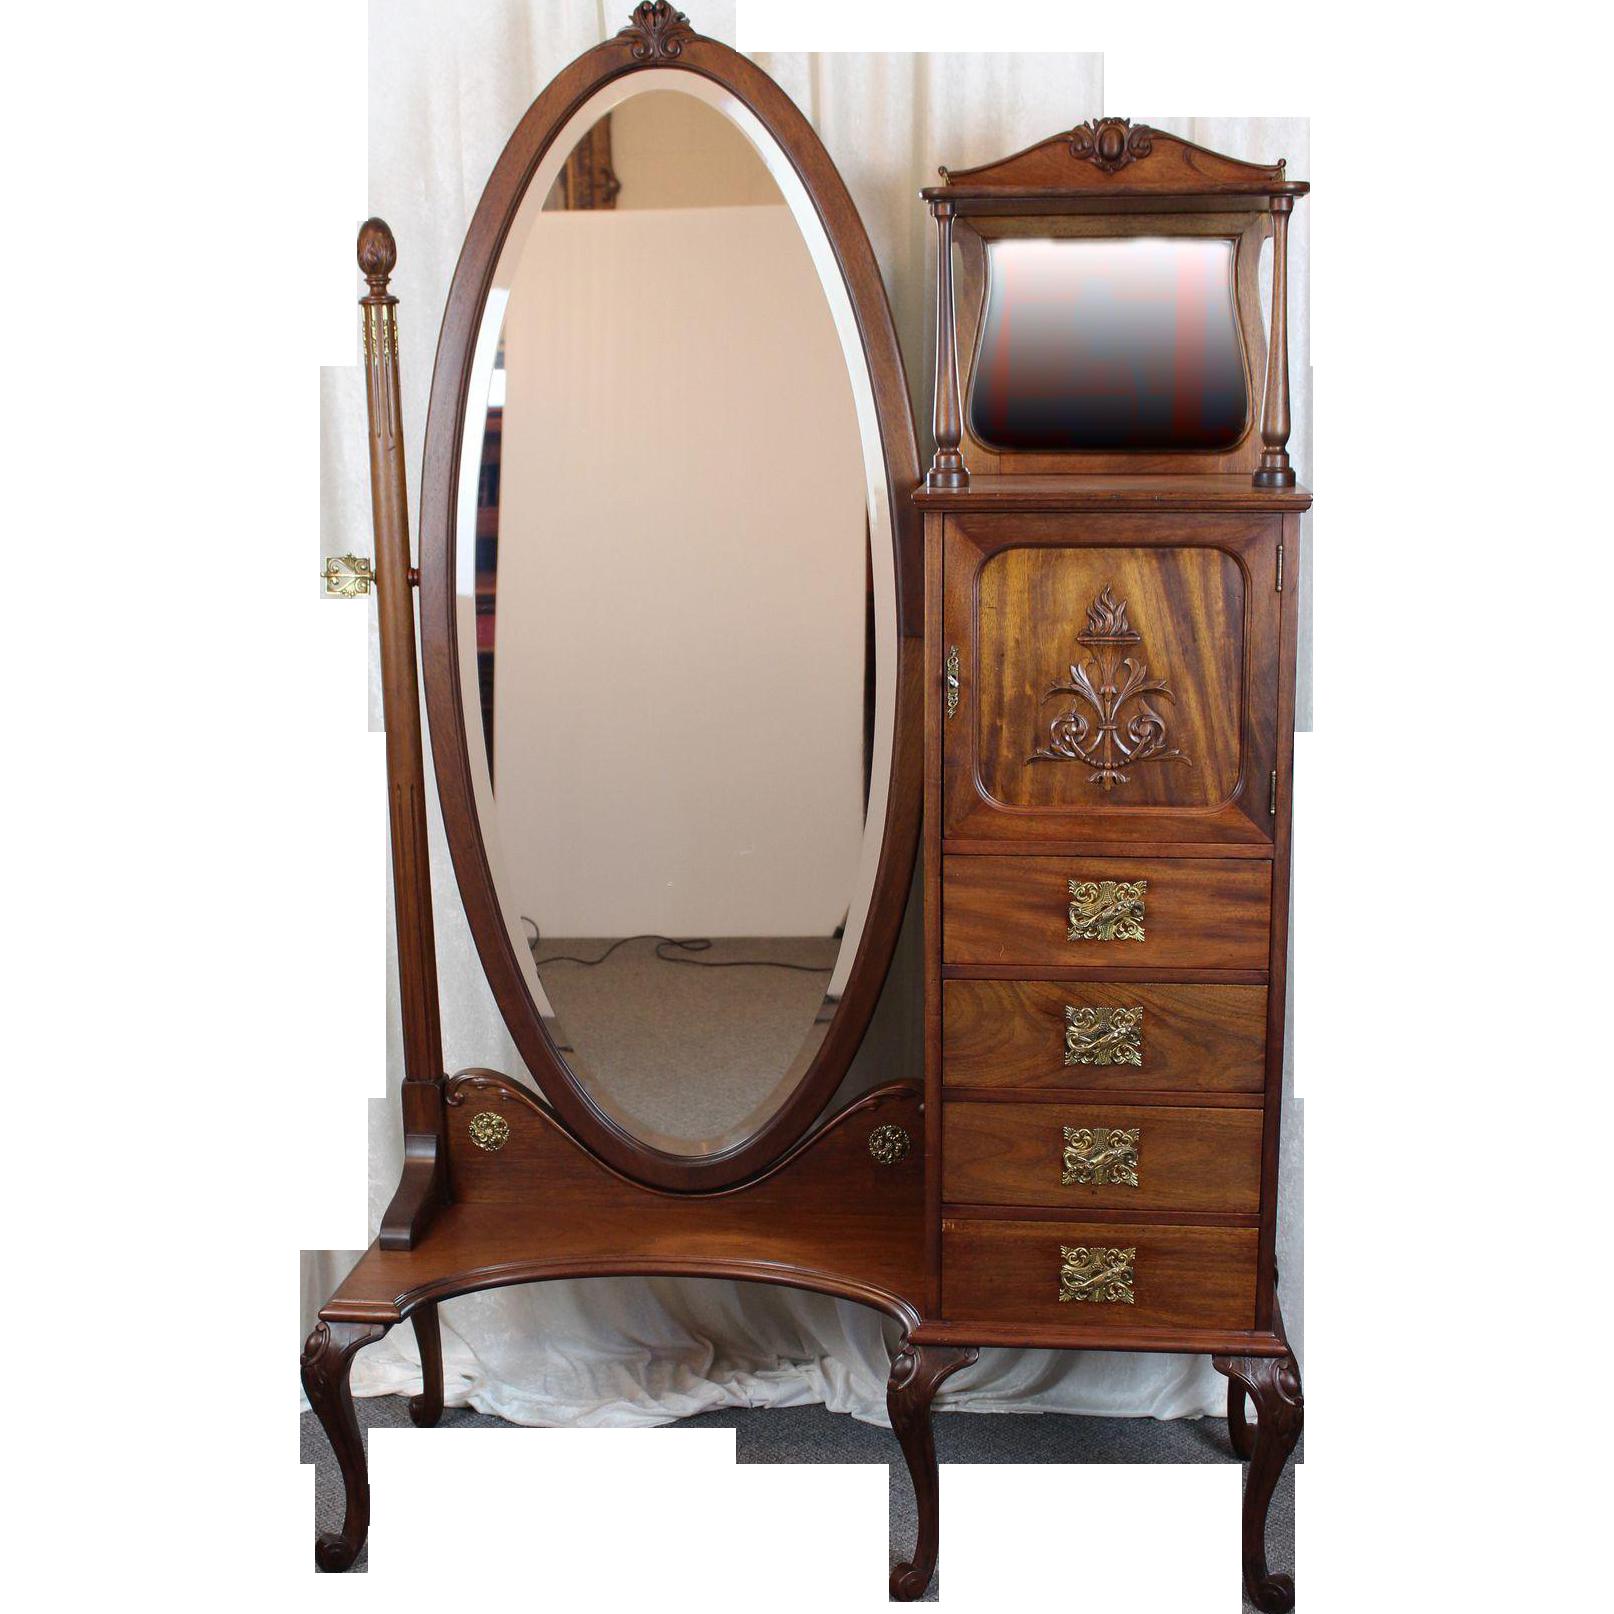 Bois peint coiffeuse Cheval Ovale Miroir Shabby Chic